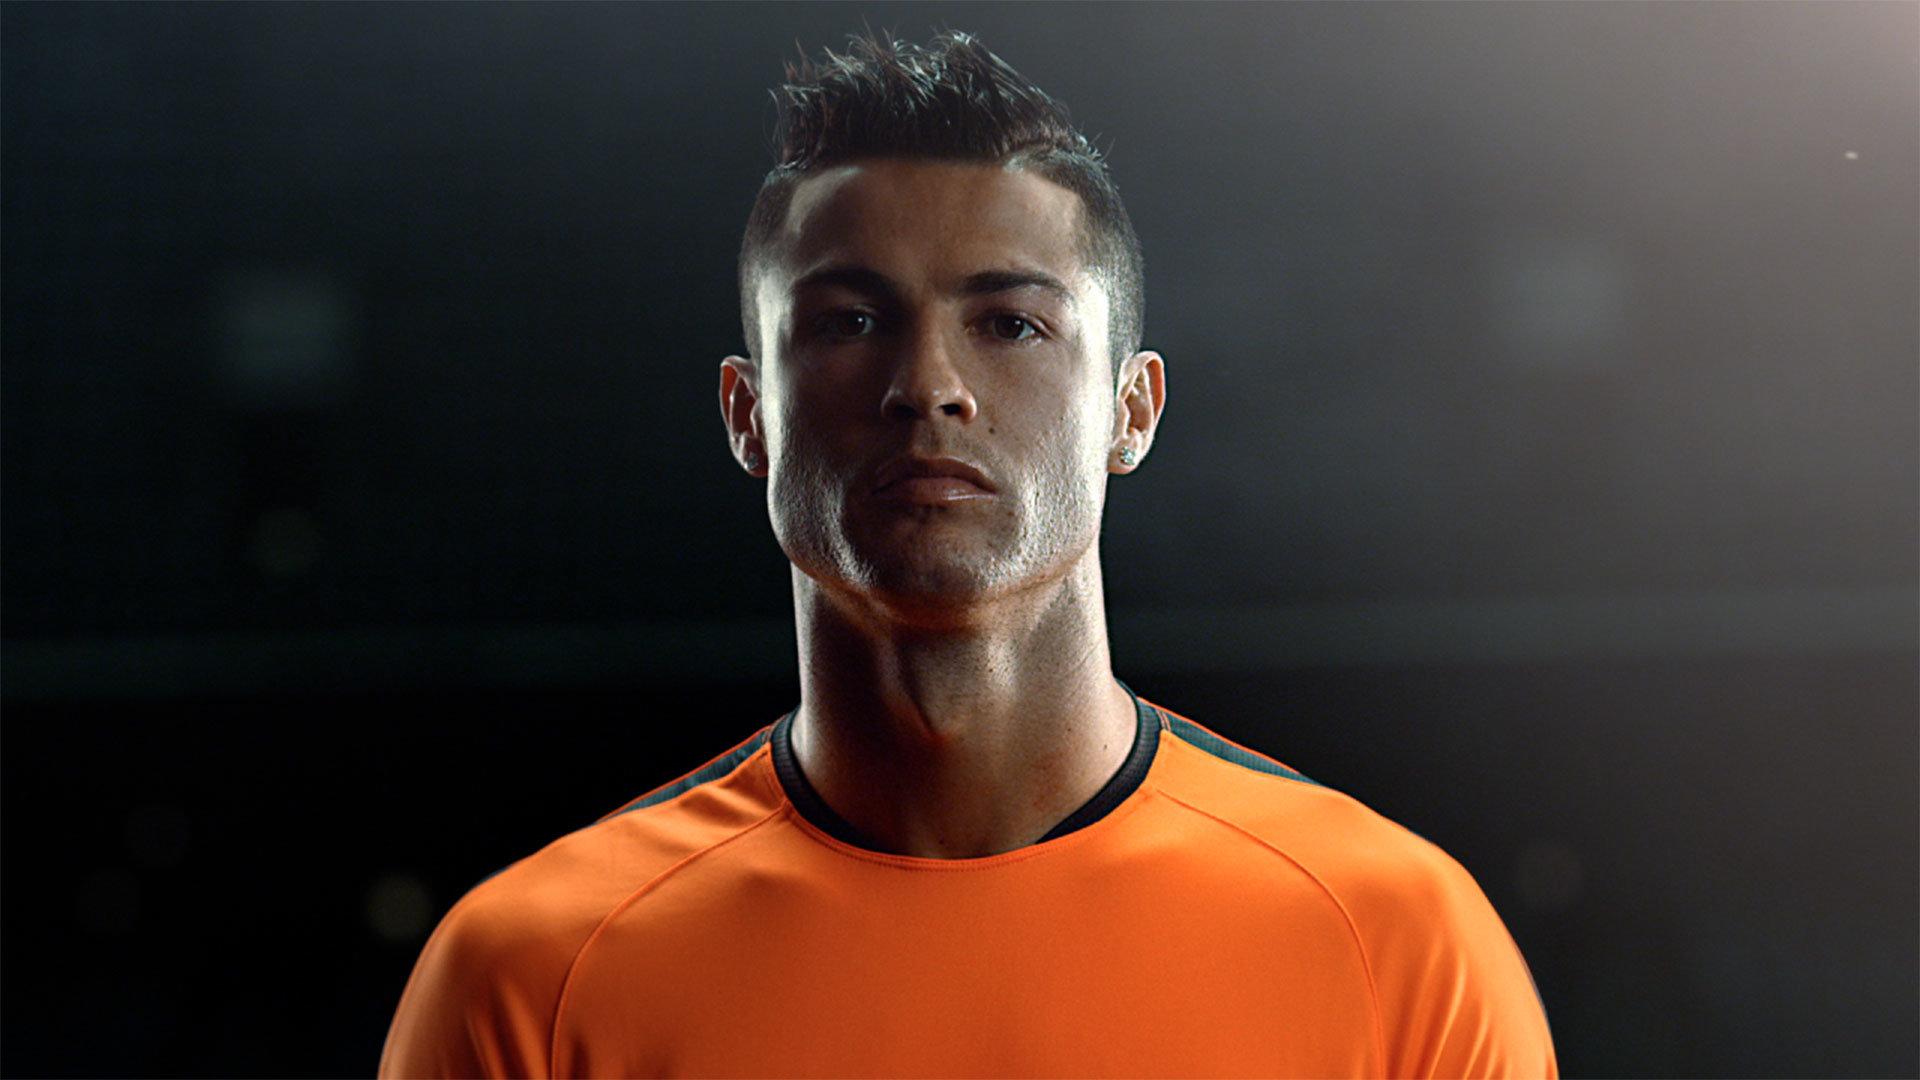 Ronaldo – Give Blood Campaign